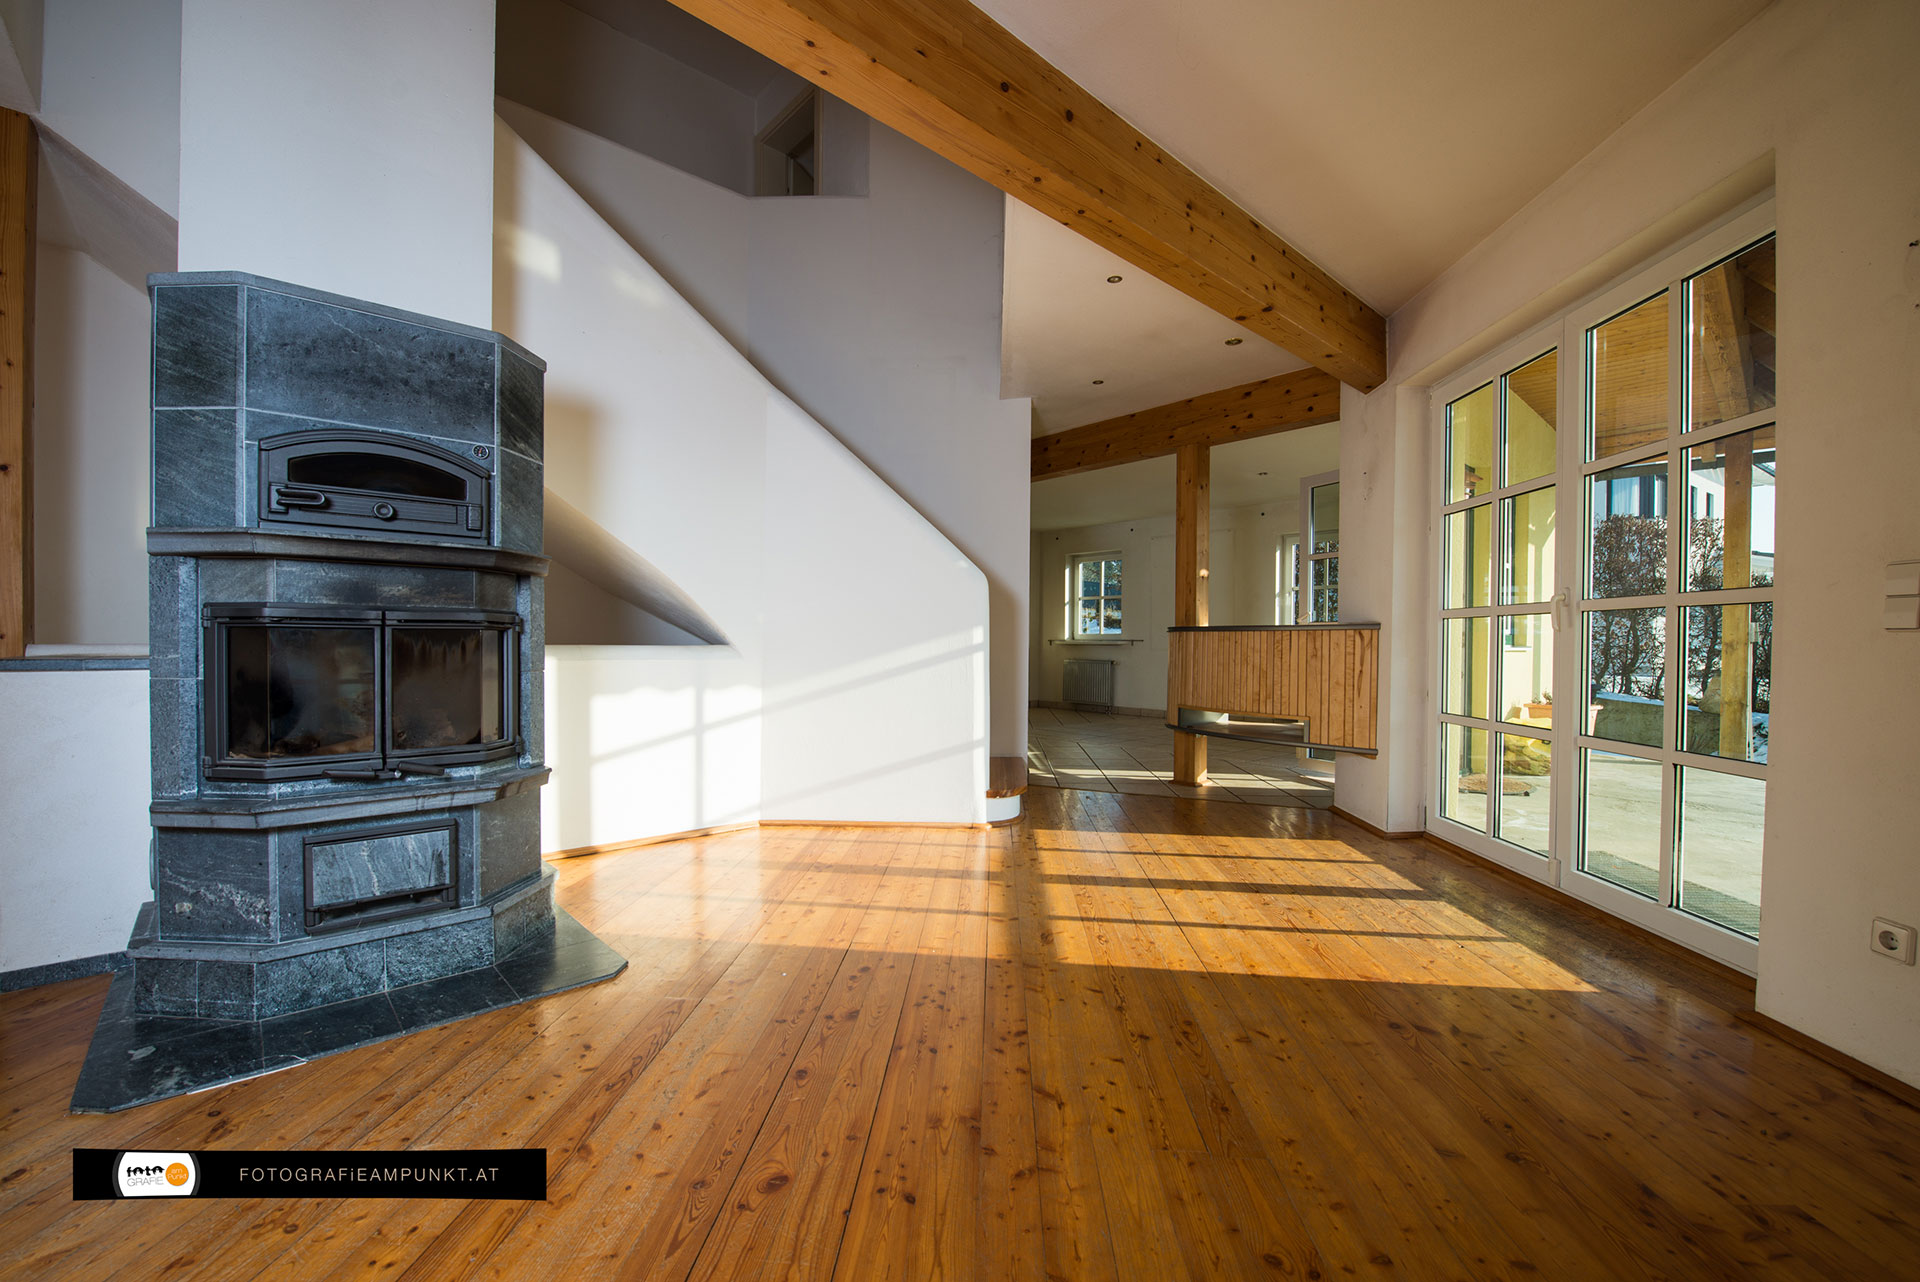 Immobilien - Fotografie am Punkt